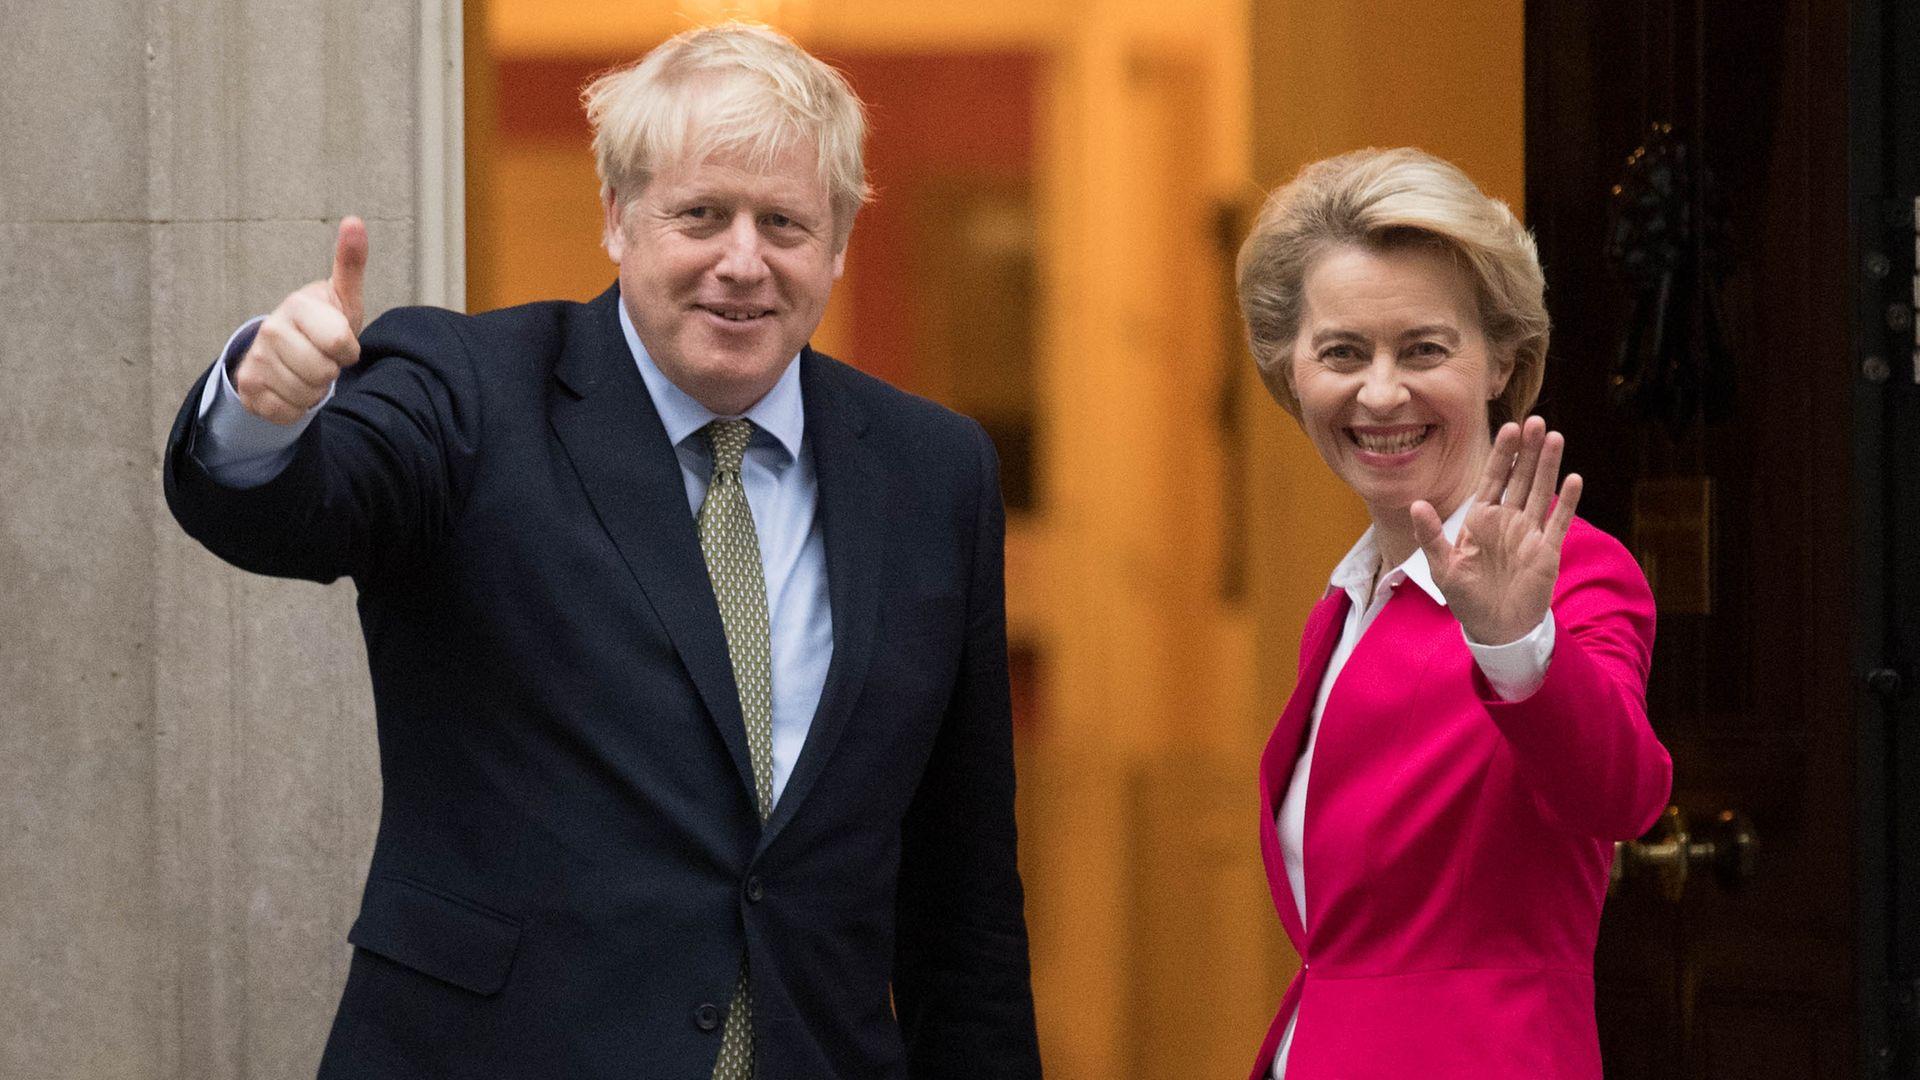 UK prime minister Boris Johnson and Ursula von der Leyen from the European Commission - Credit: PA